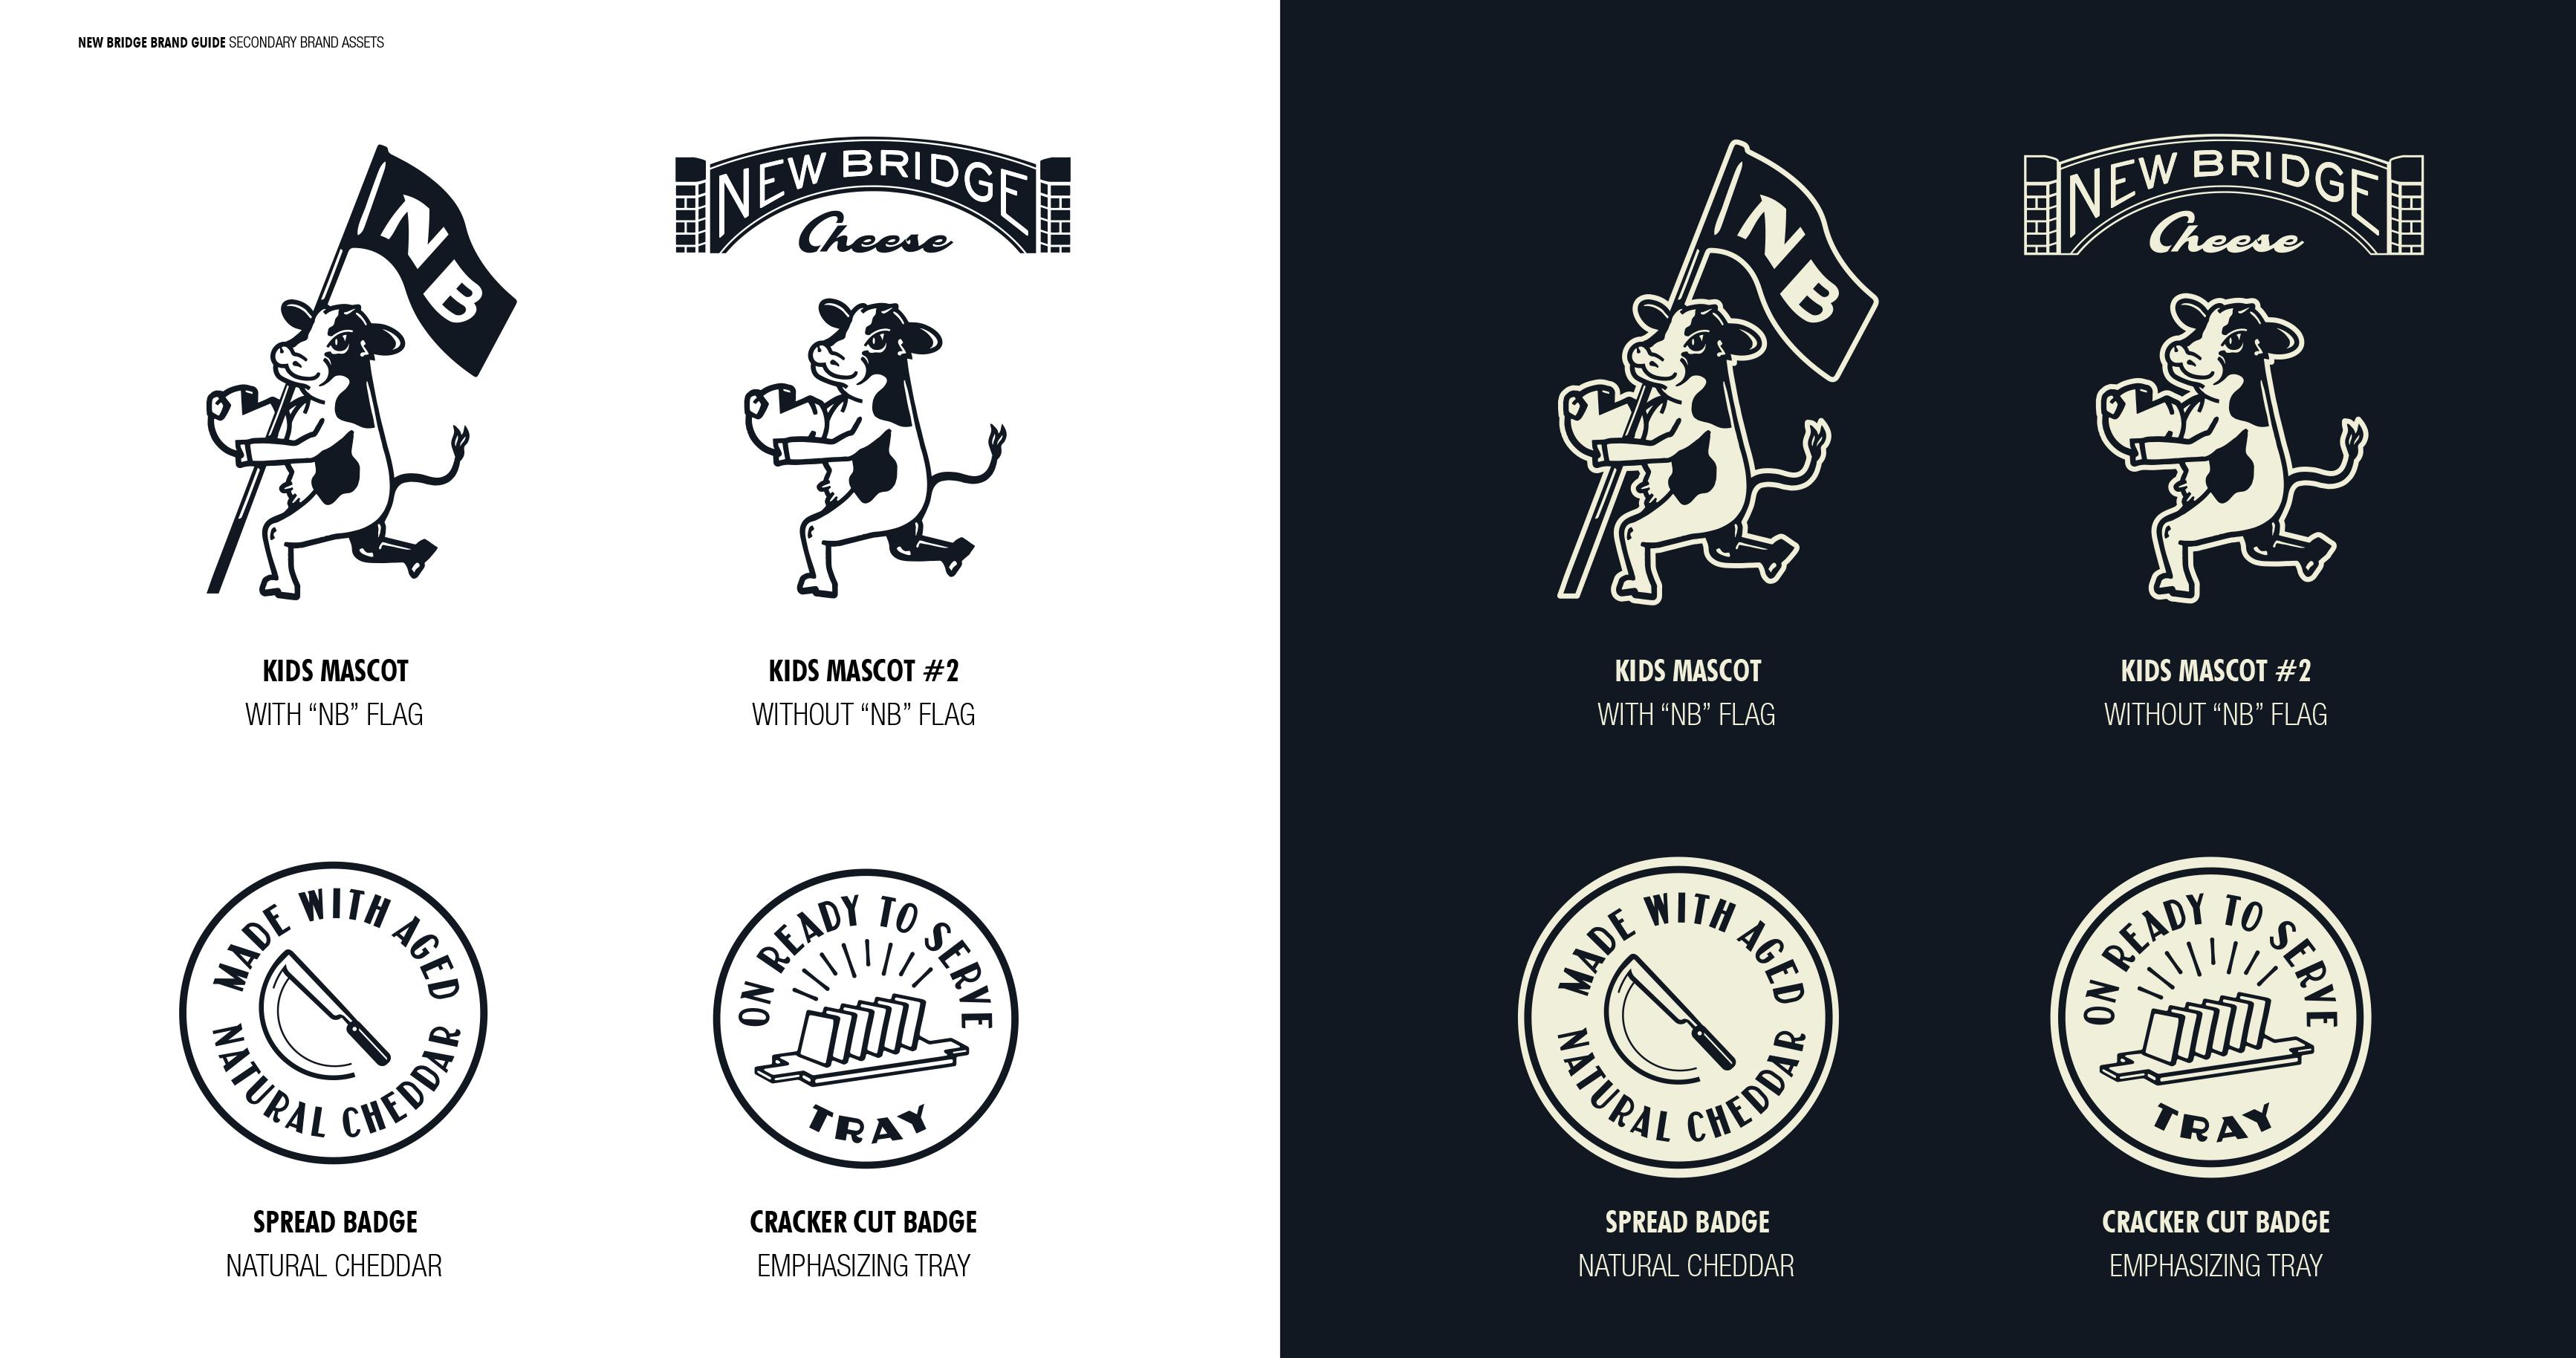 secodary-assets-new-bridge-cheese-design-exploration-zeki-michael-design-cheese-cow-spread-tub-sku-range-agency-branding copy